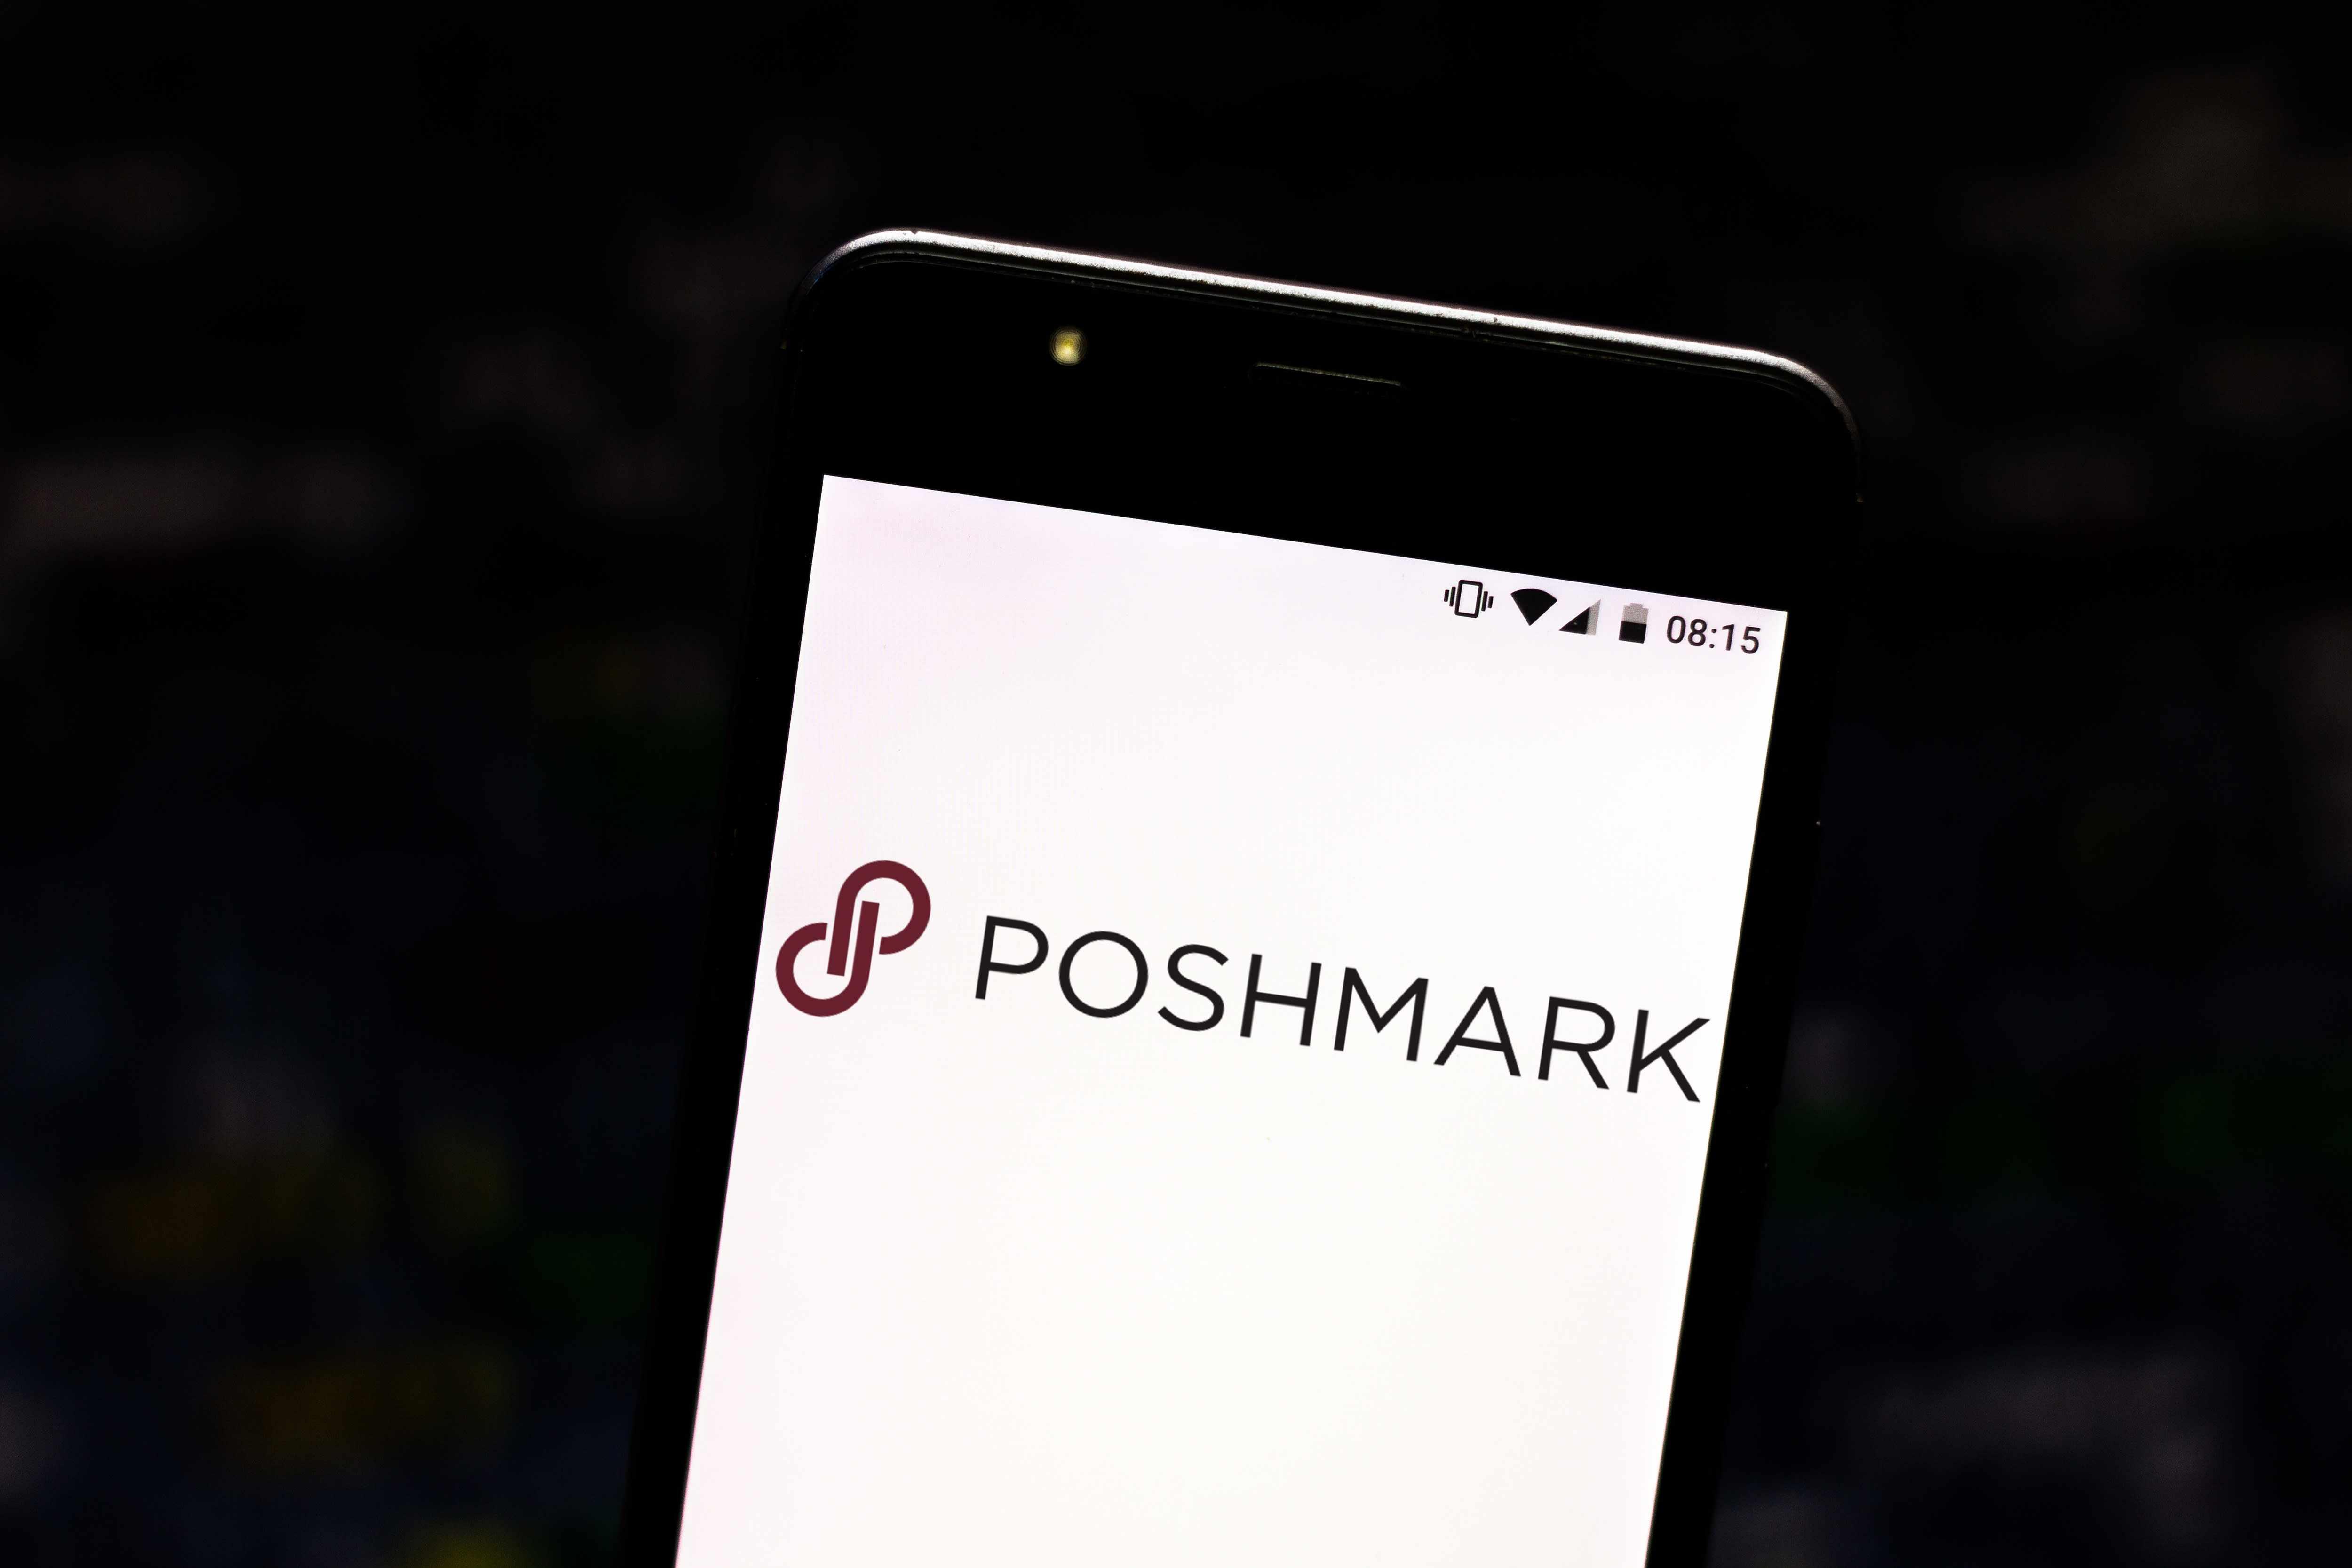 poshmark online clothing reseller company